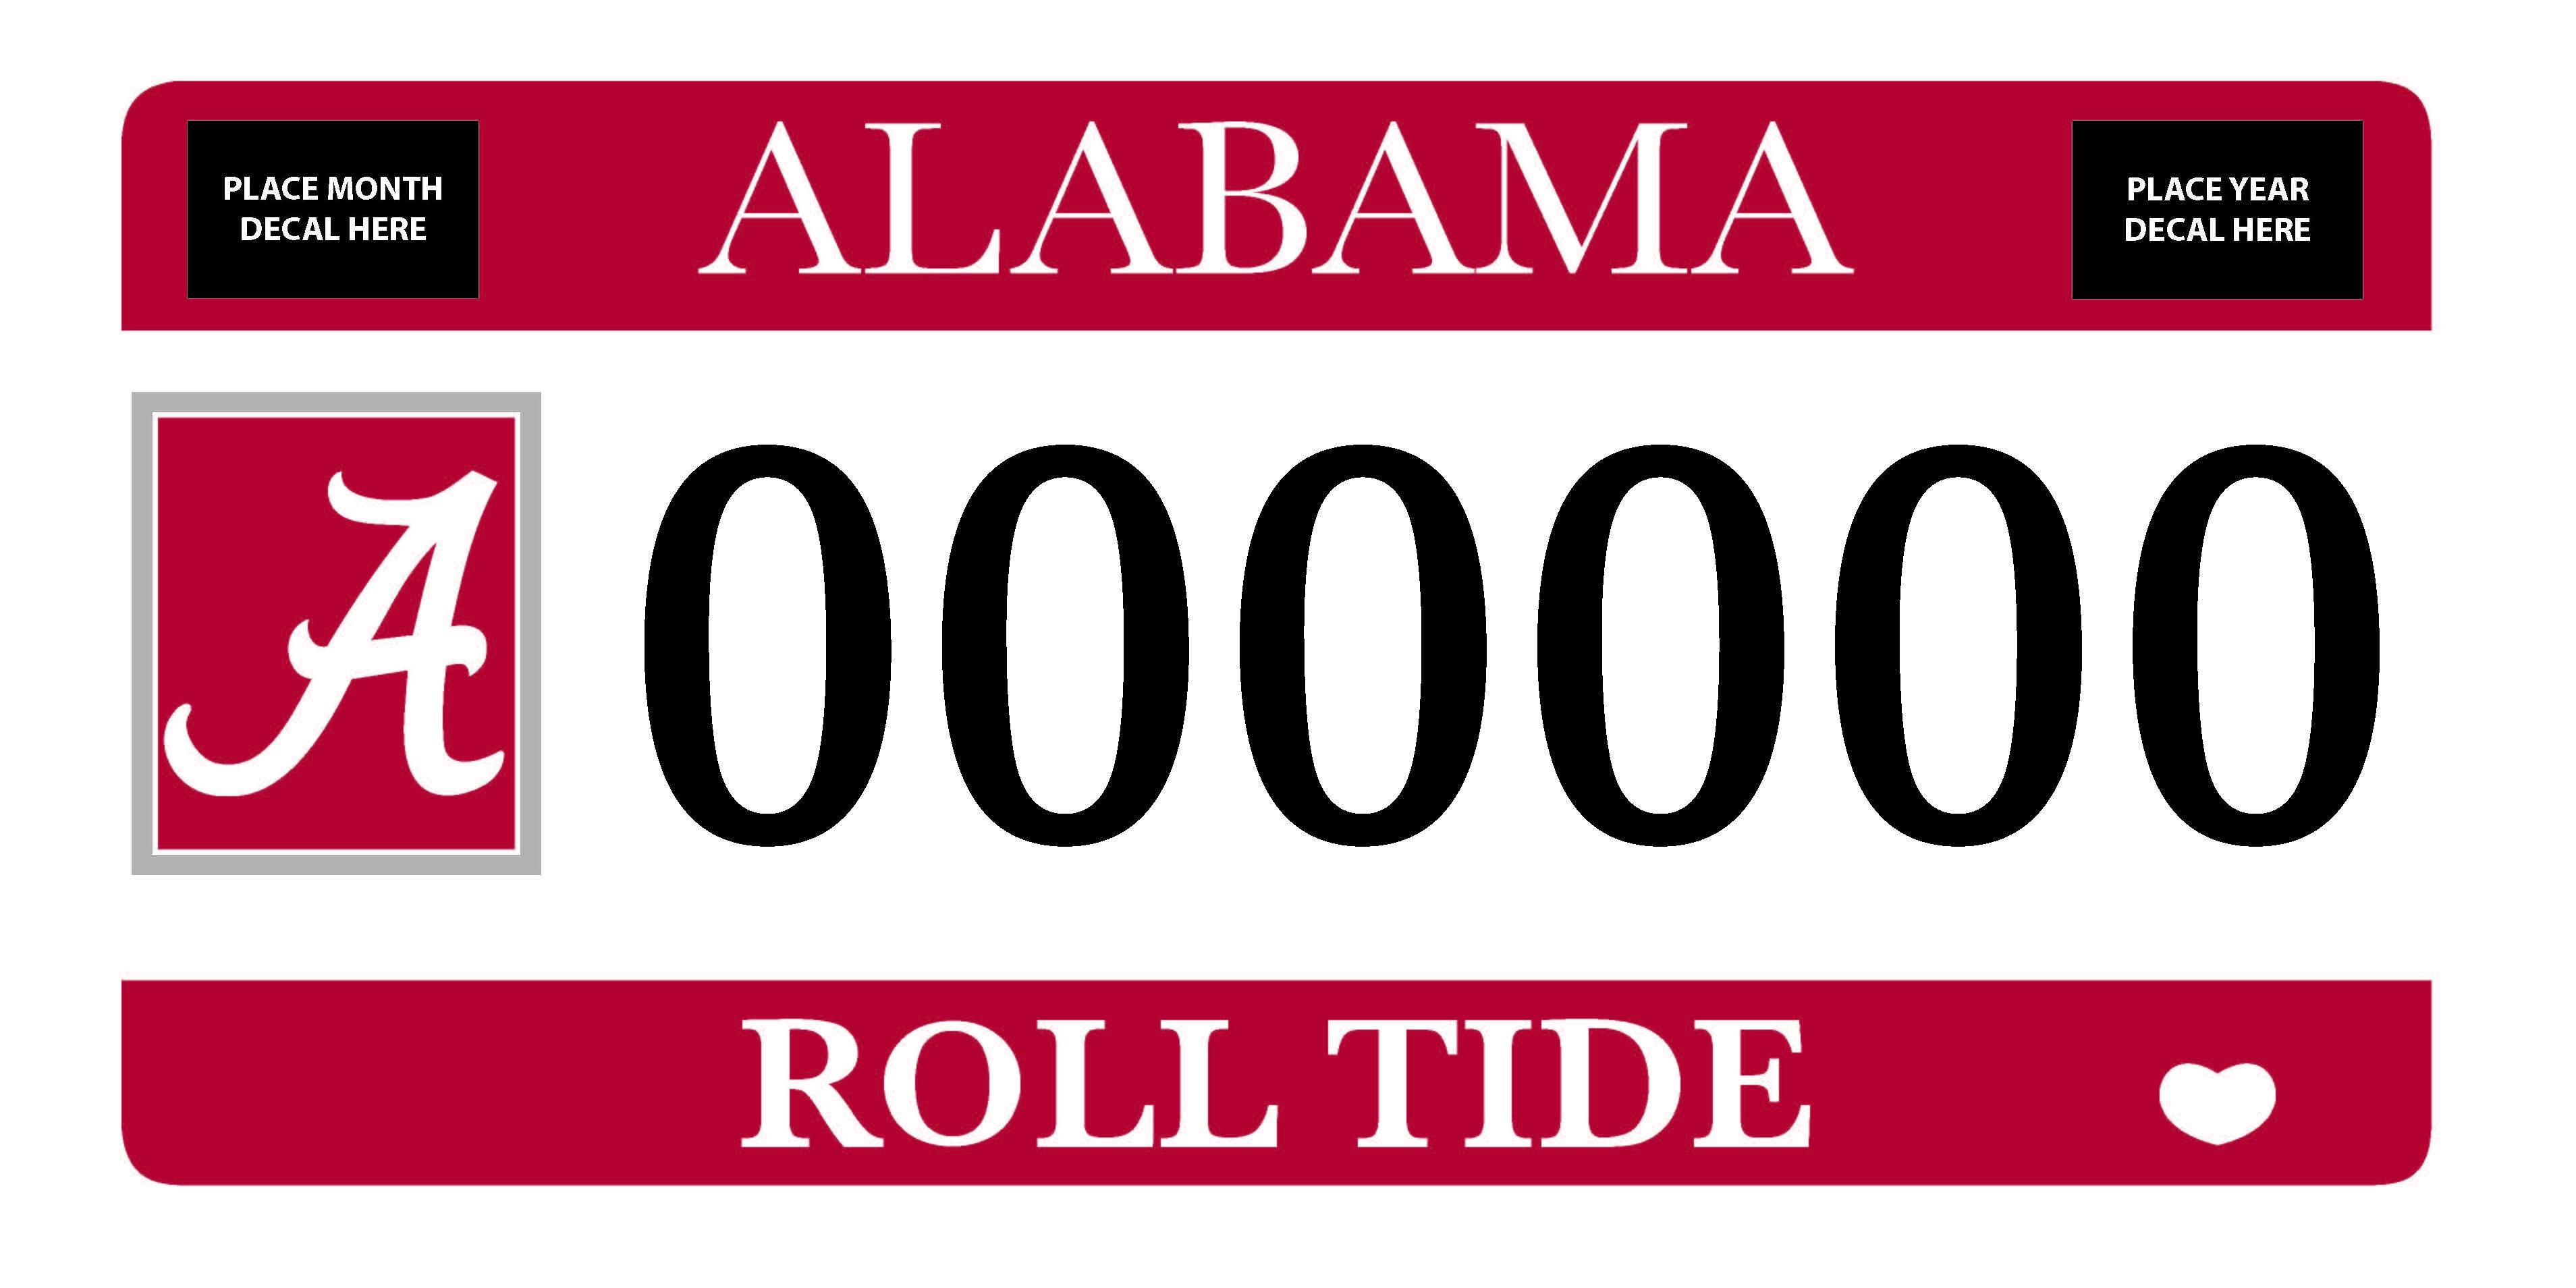 Alabama Car Tags >> Depaul University Hoodies University Of Alabama Car Tags